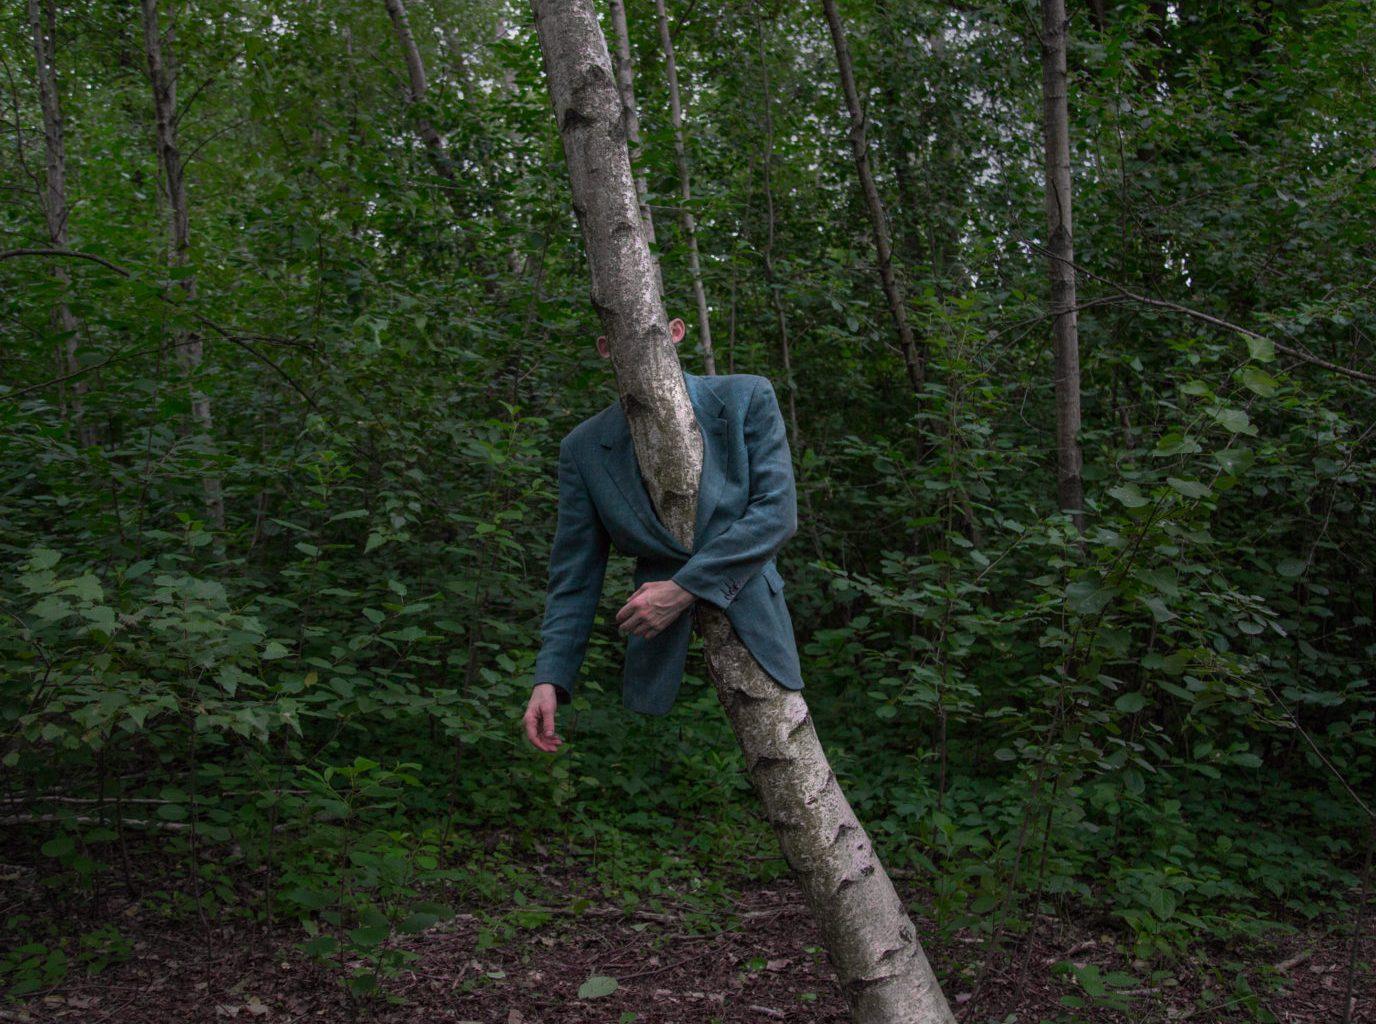 Hombre en bosque con un tronco